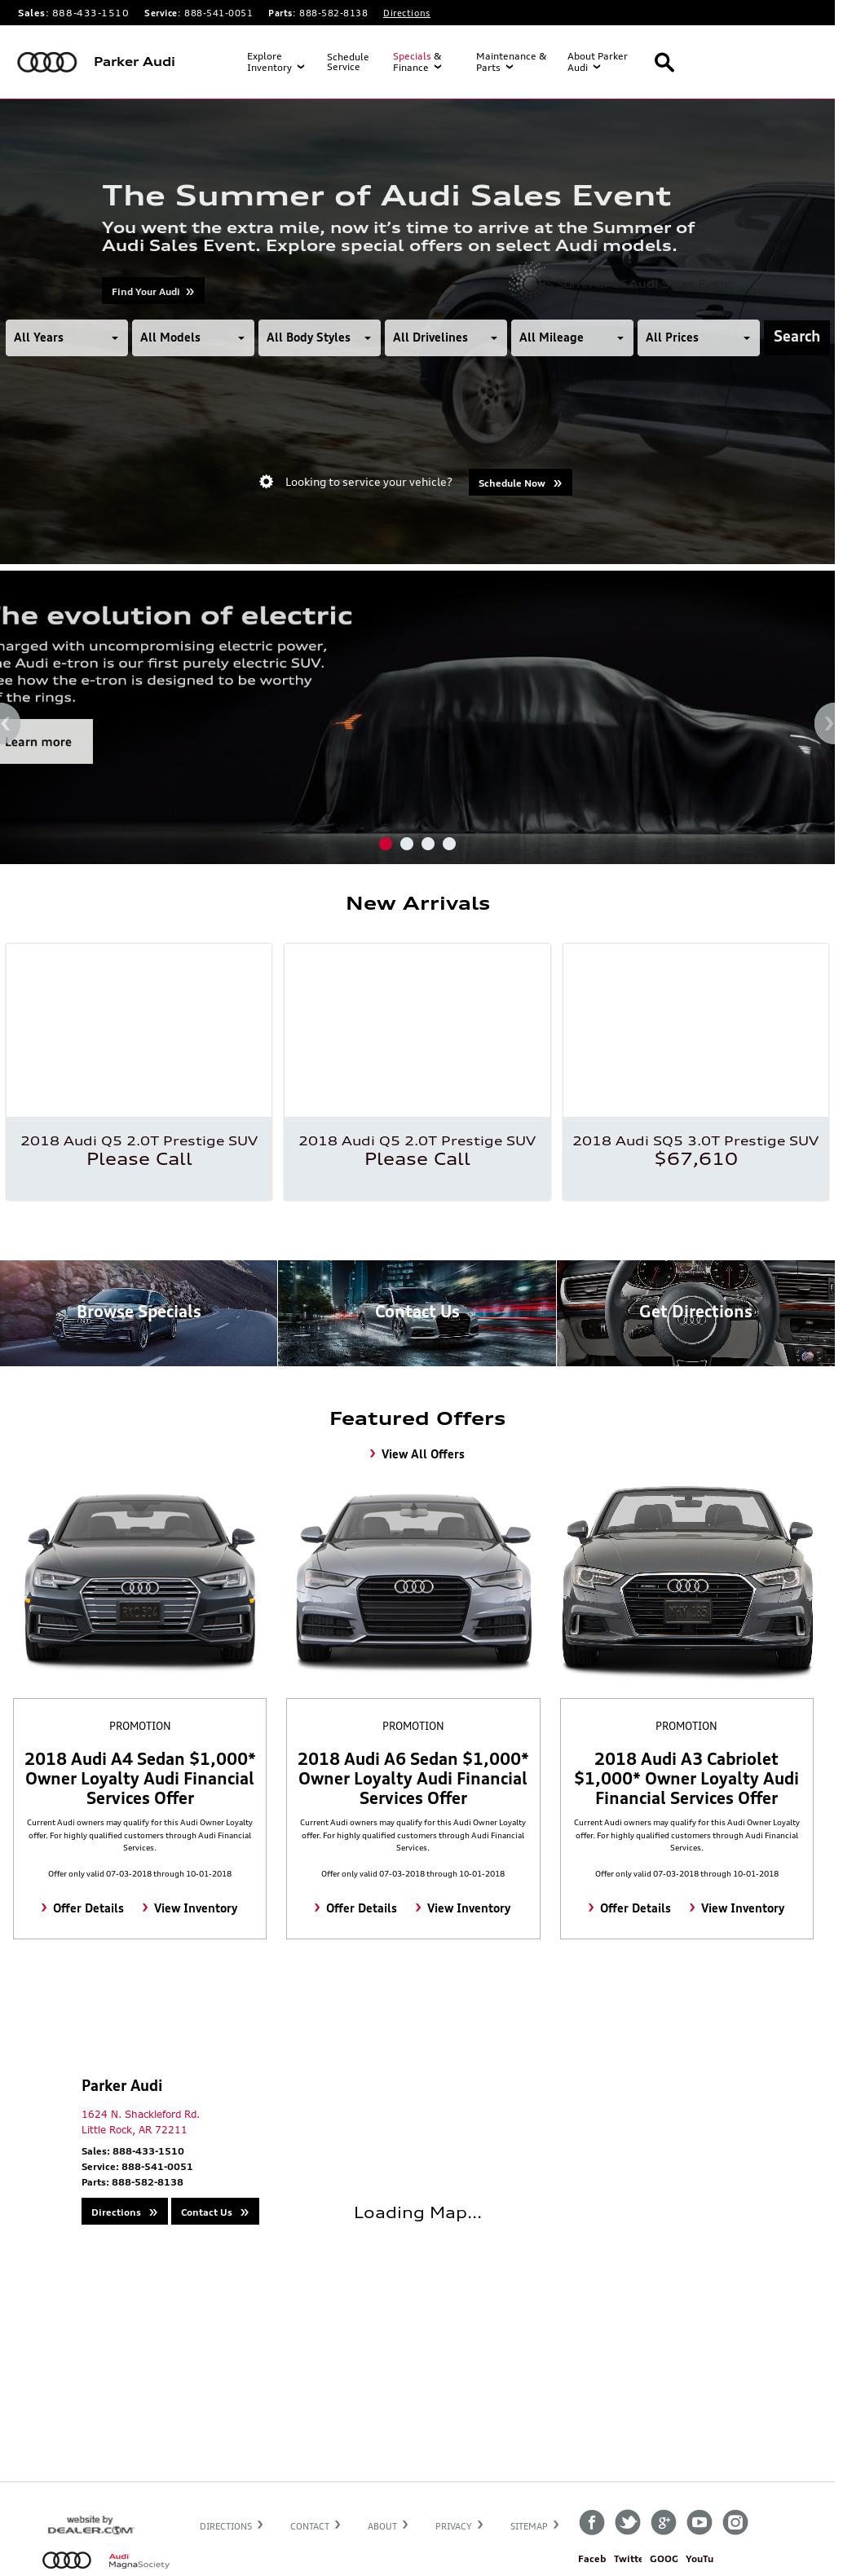 Parker Audi Competitors Revenue And Employees Owler Company Profile - Parker audi